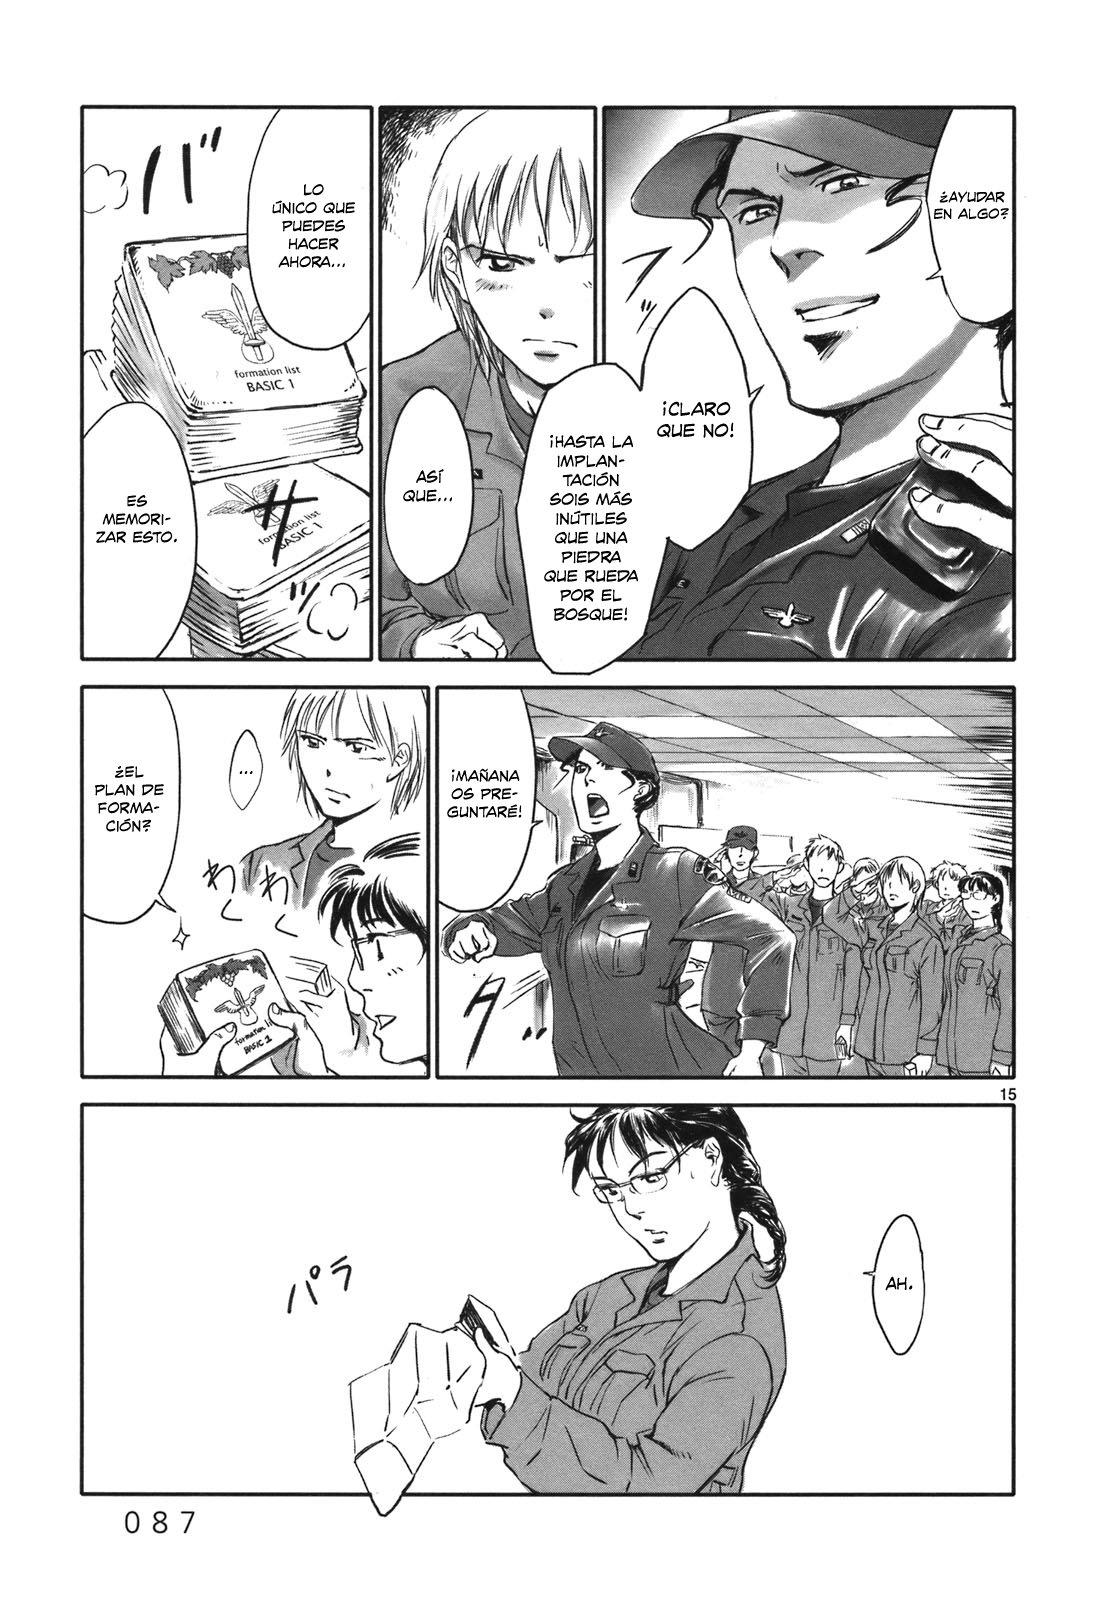 https://nine.mangadogs.com/es_manga/pic8/7/36679/946758/bcdbe9d490ff5a996e6d3ee5ba1409bf.jpg Page 20